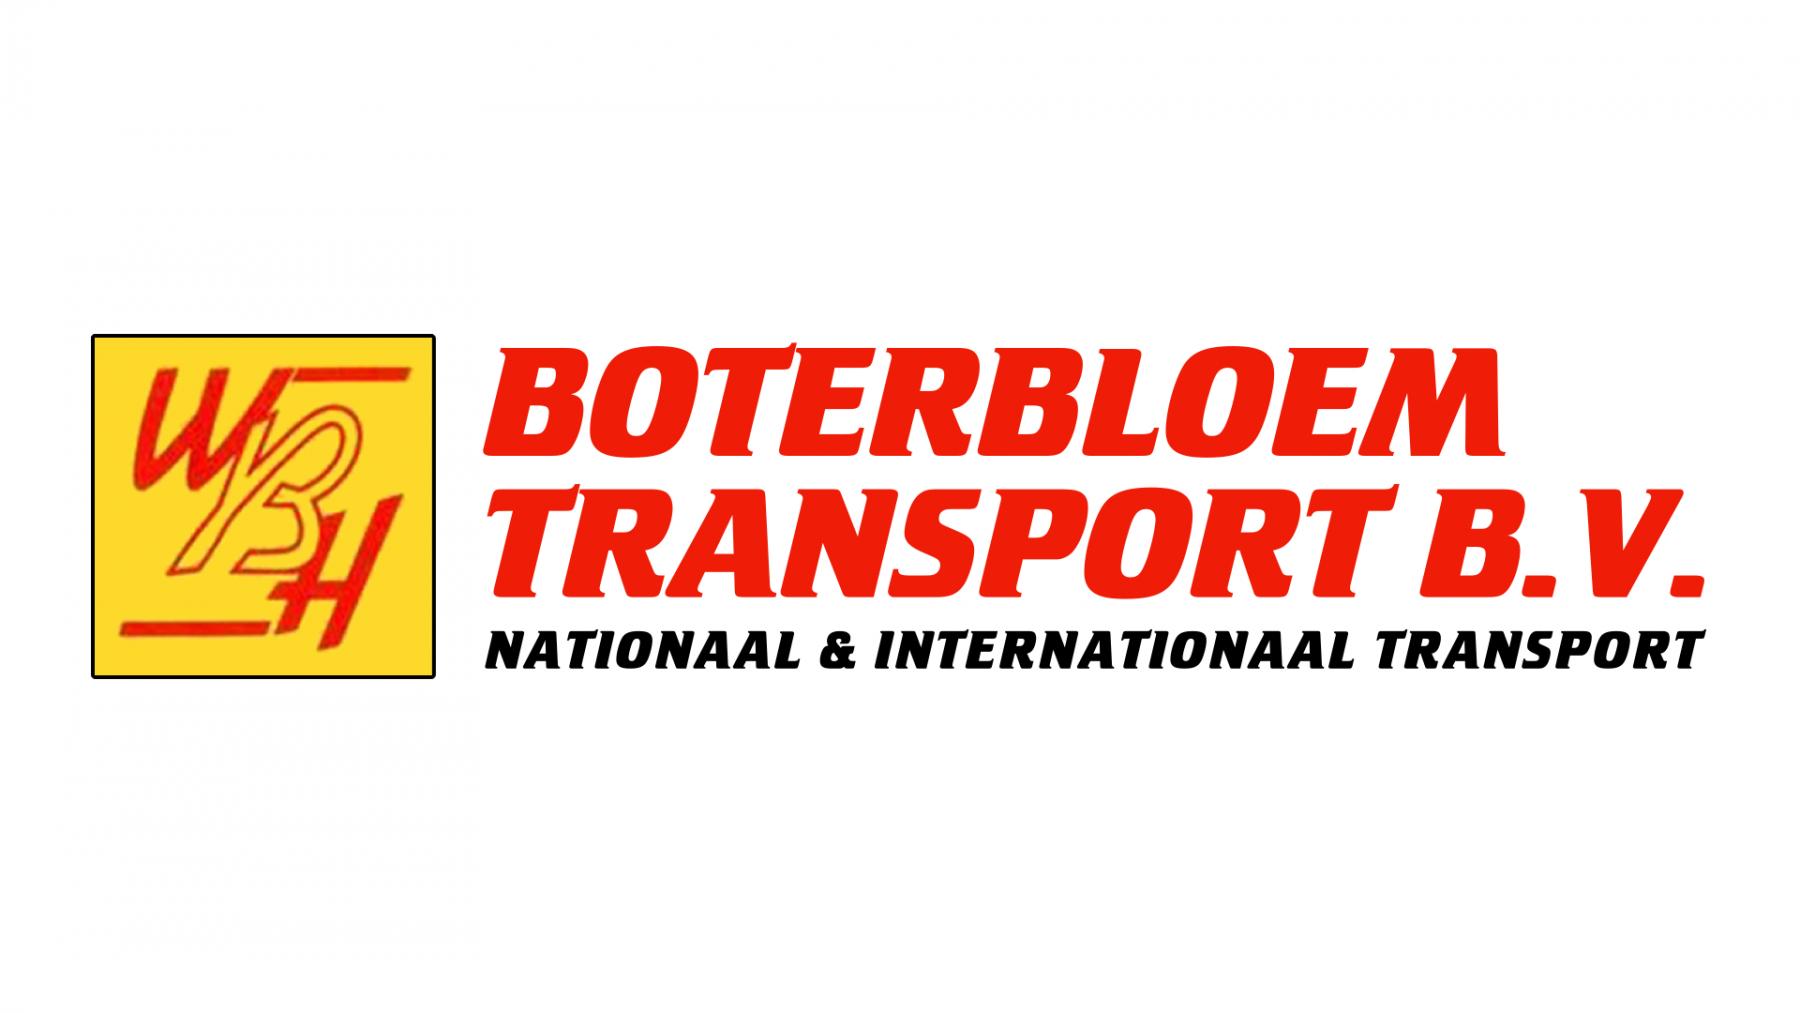 Boterbloem-Transport.fw_